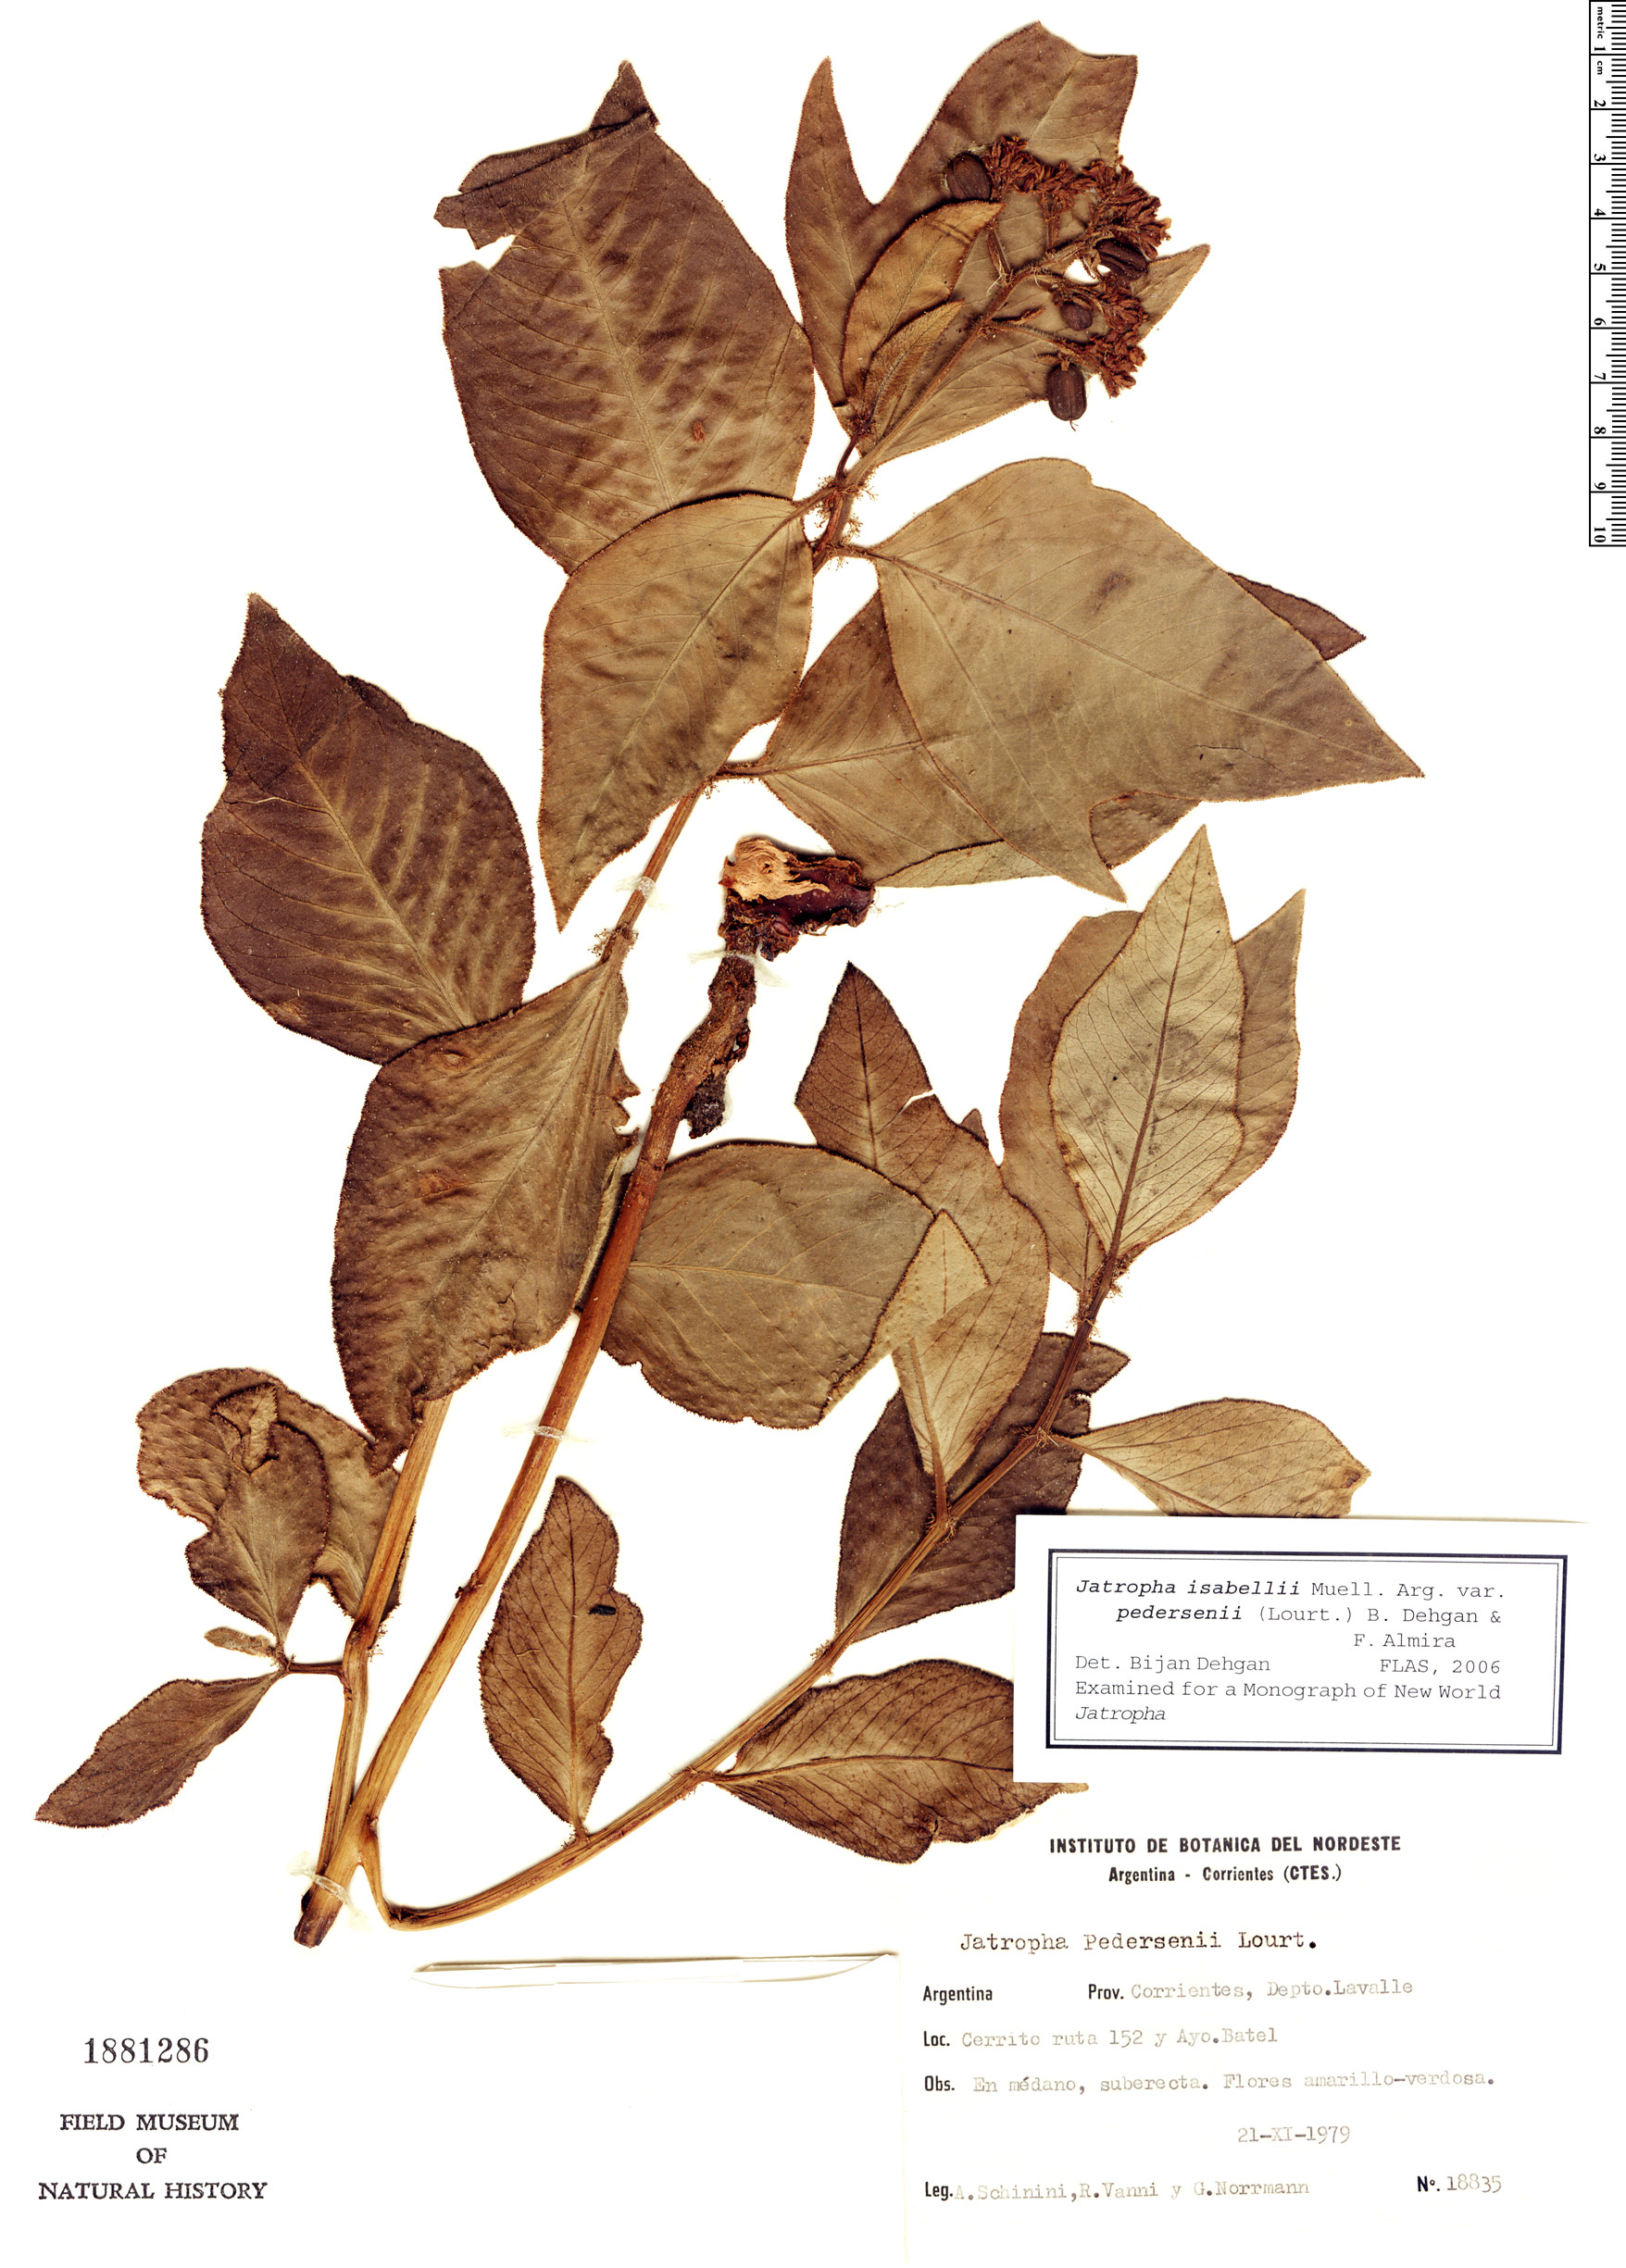 Specimen: Jatropha pedersenii